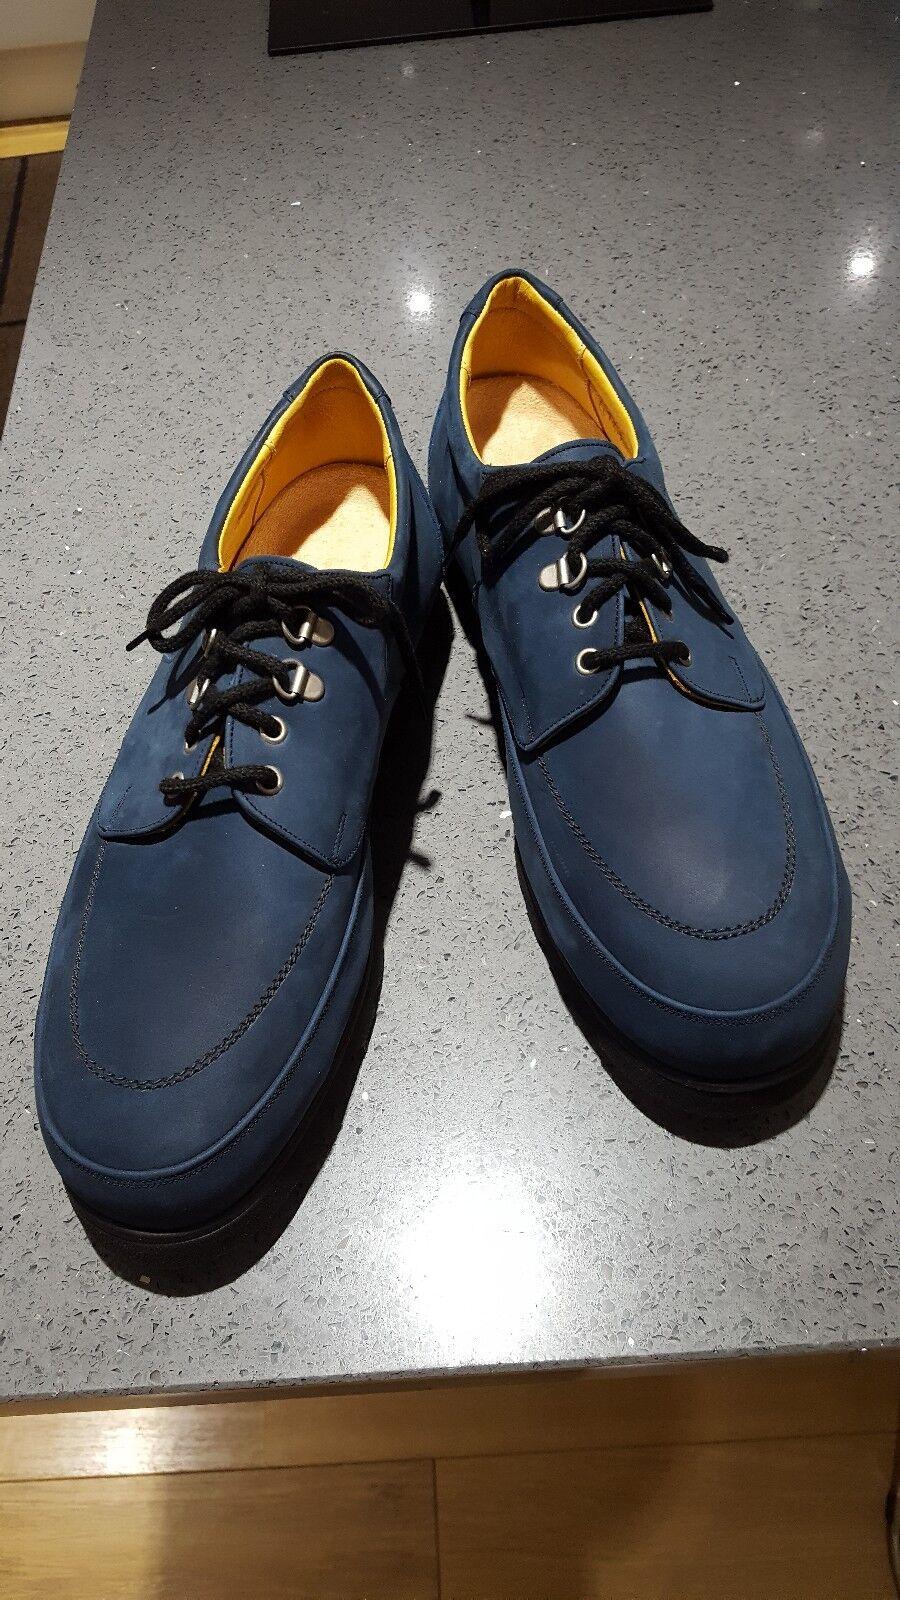 8OR Men UK Size 11 Navy Nubuck Leather Slim Fitting Medical shoes